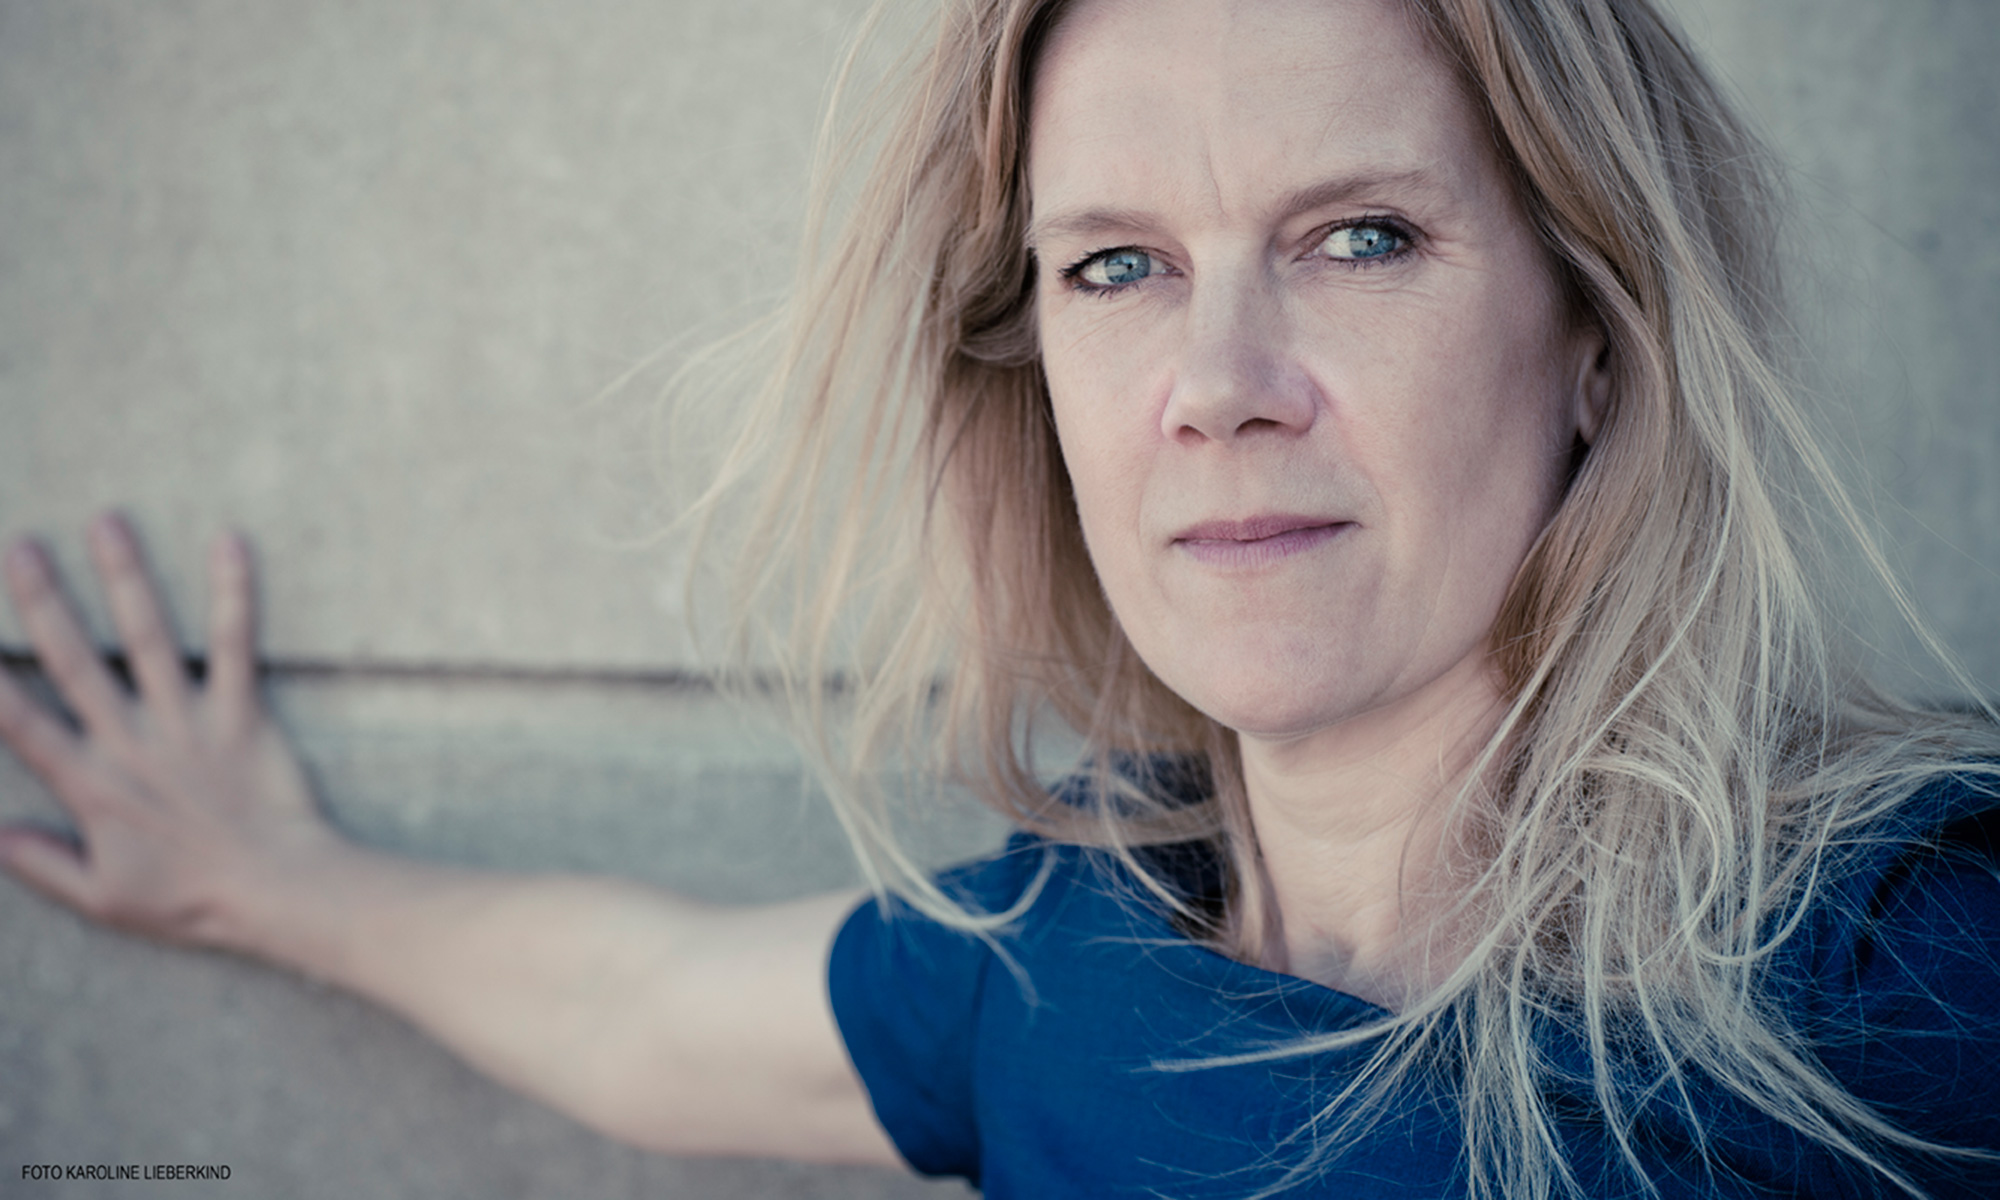 Line Svendsen